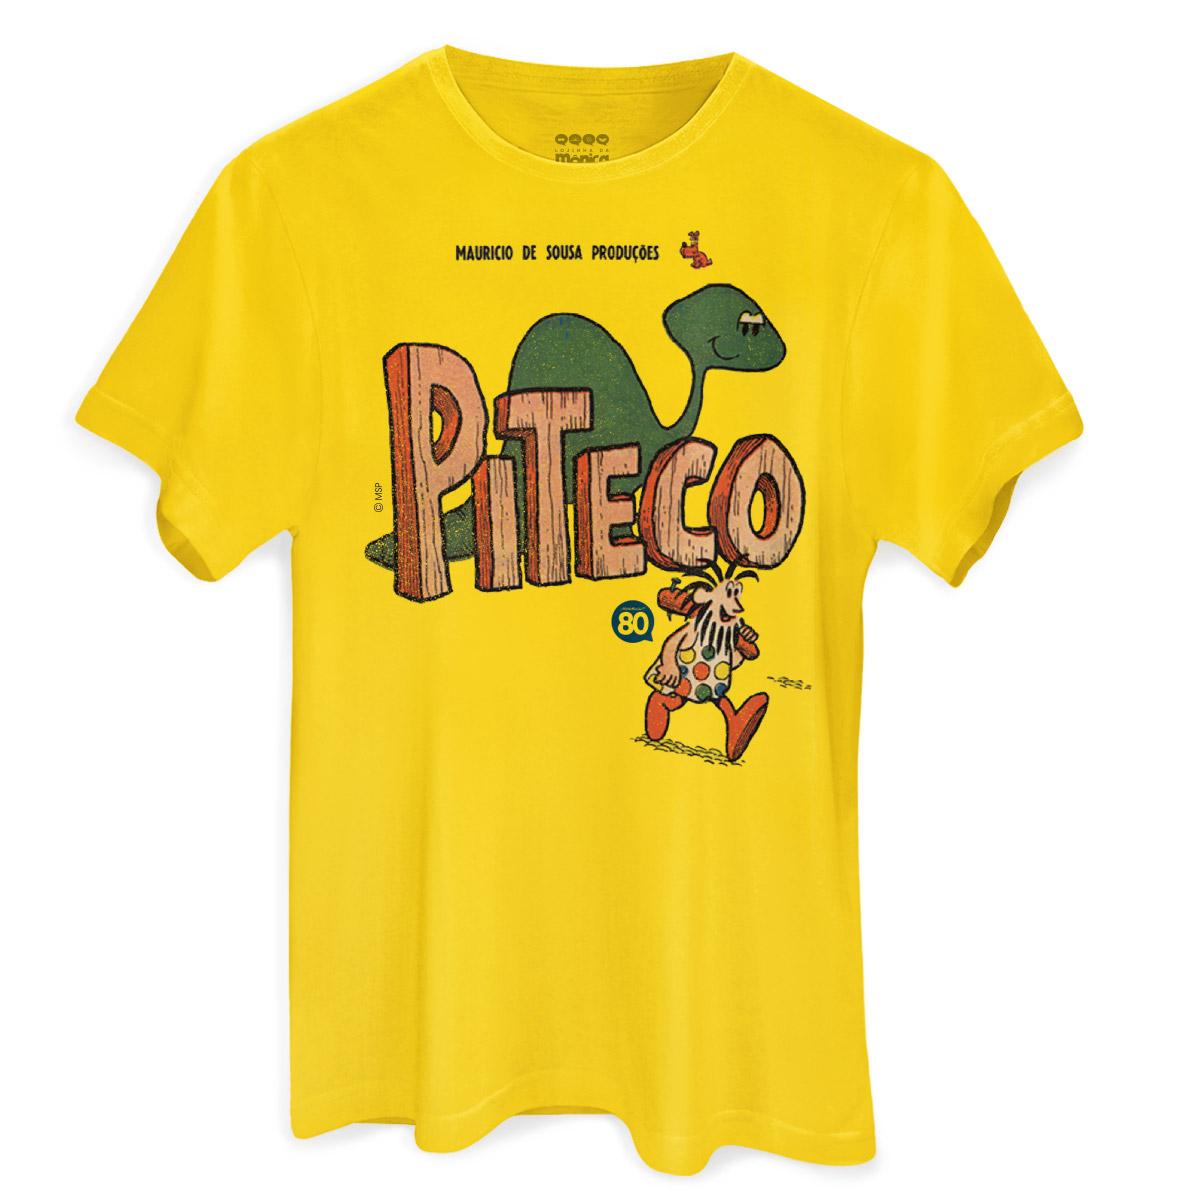 54688b2a32 Camiseta Masculina Turma da Mônica HQ Piteco